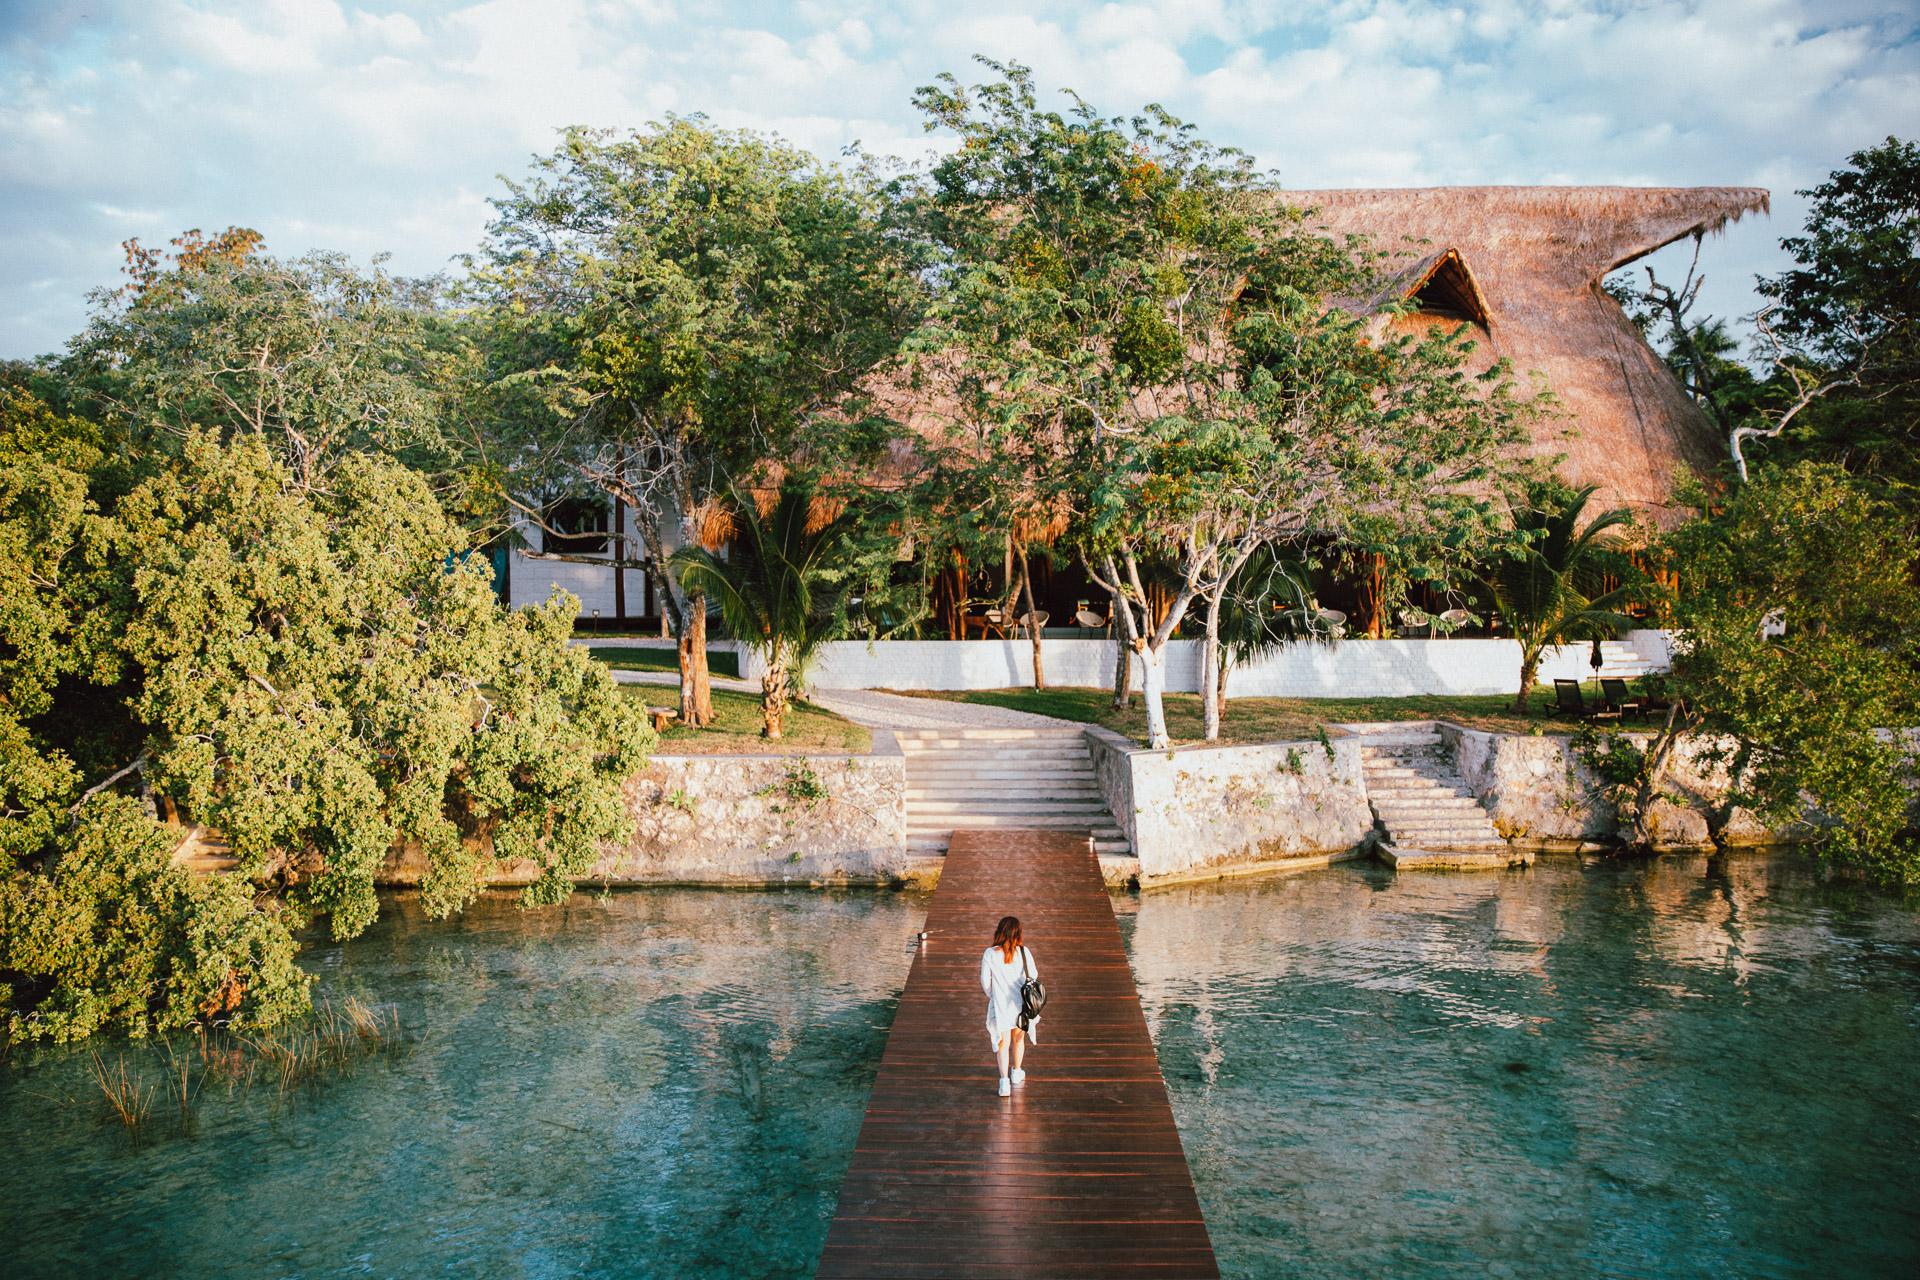 mexico-luxury-hotel-photographer-riviera-maya-mia-bacalar-10.jpg